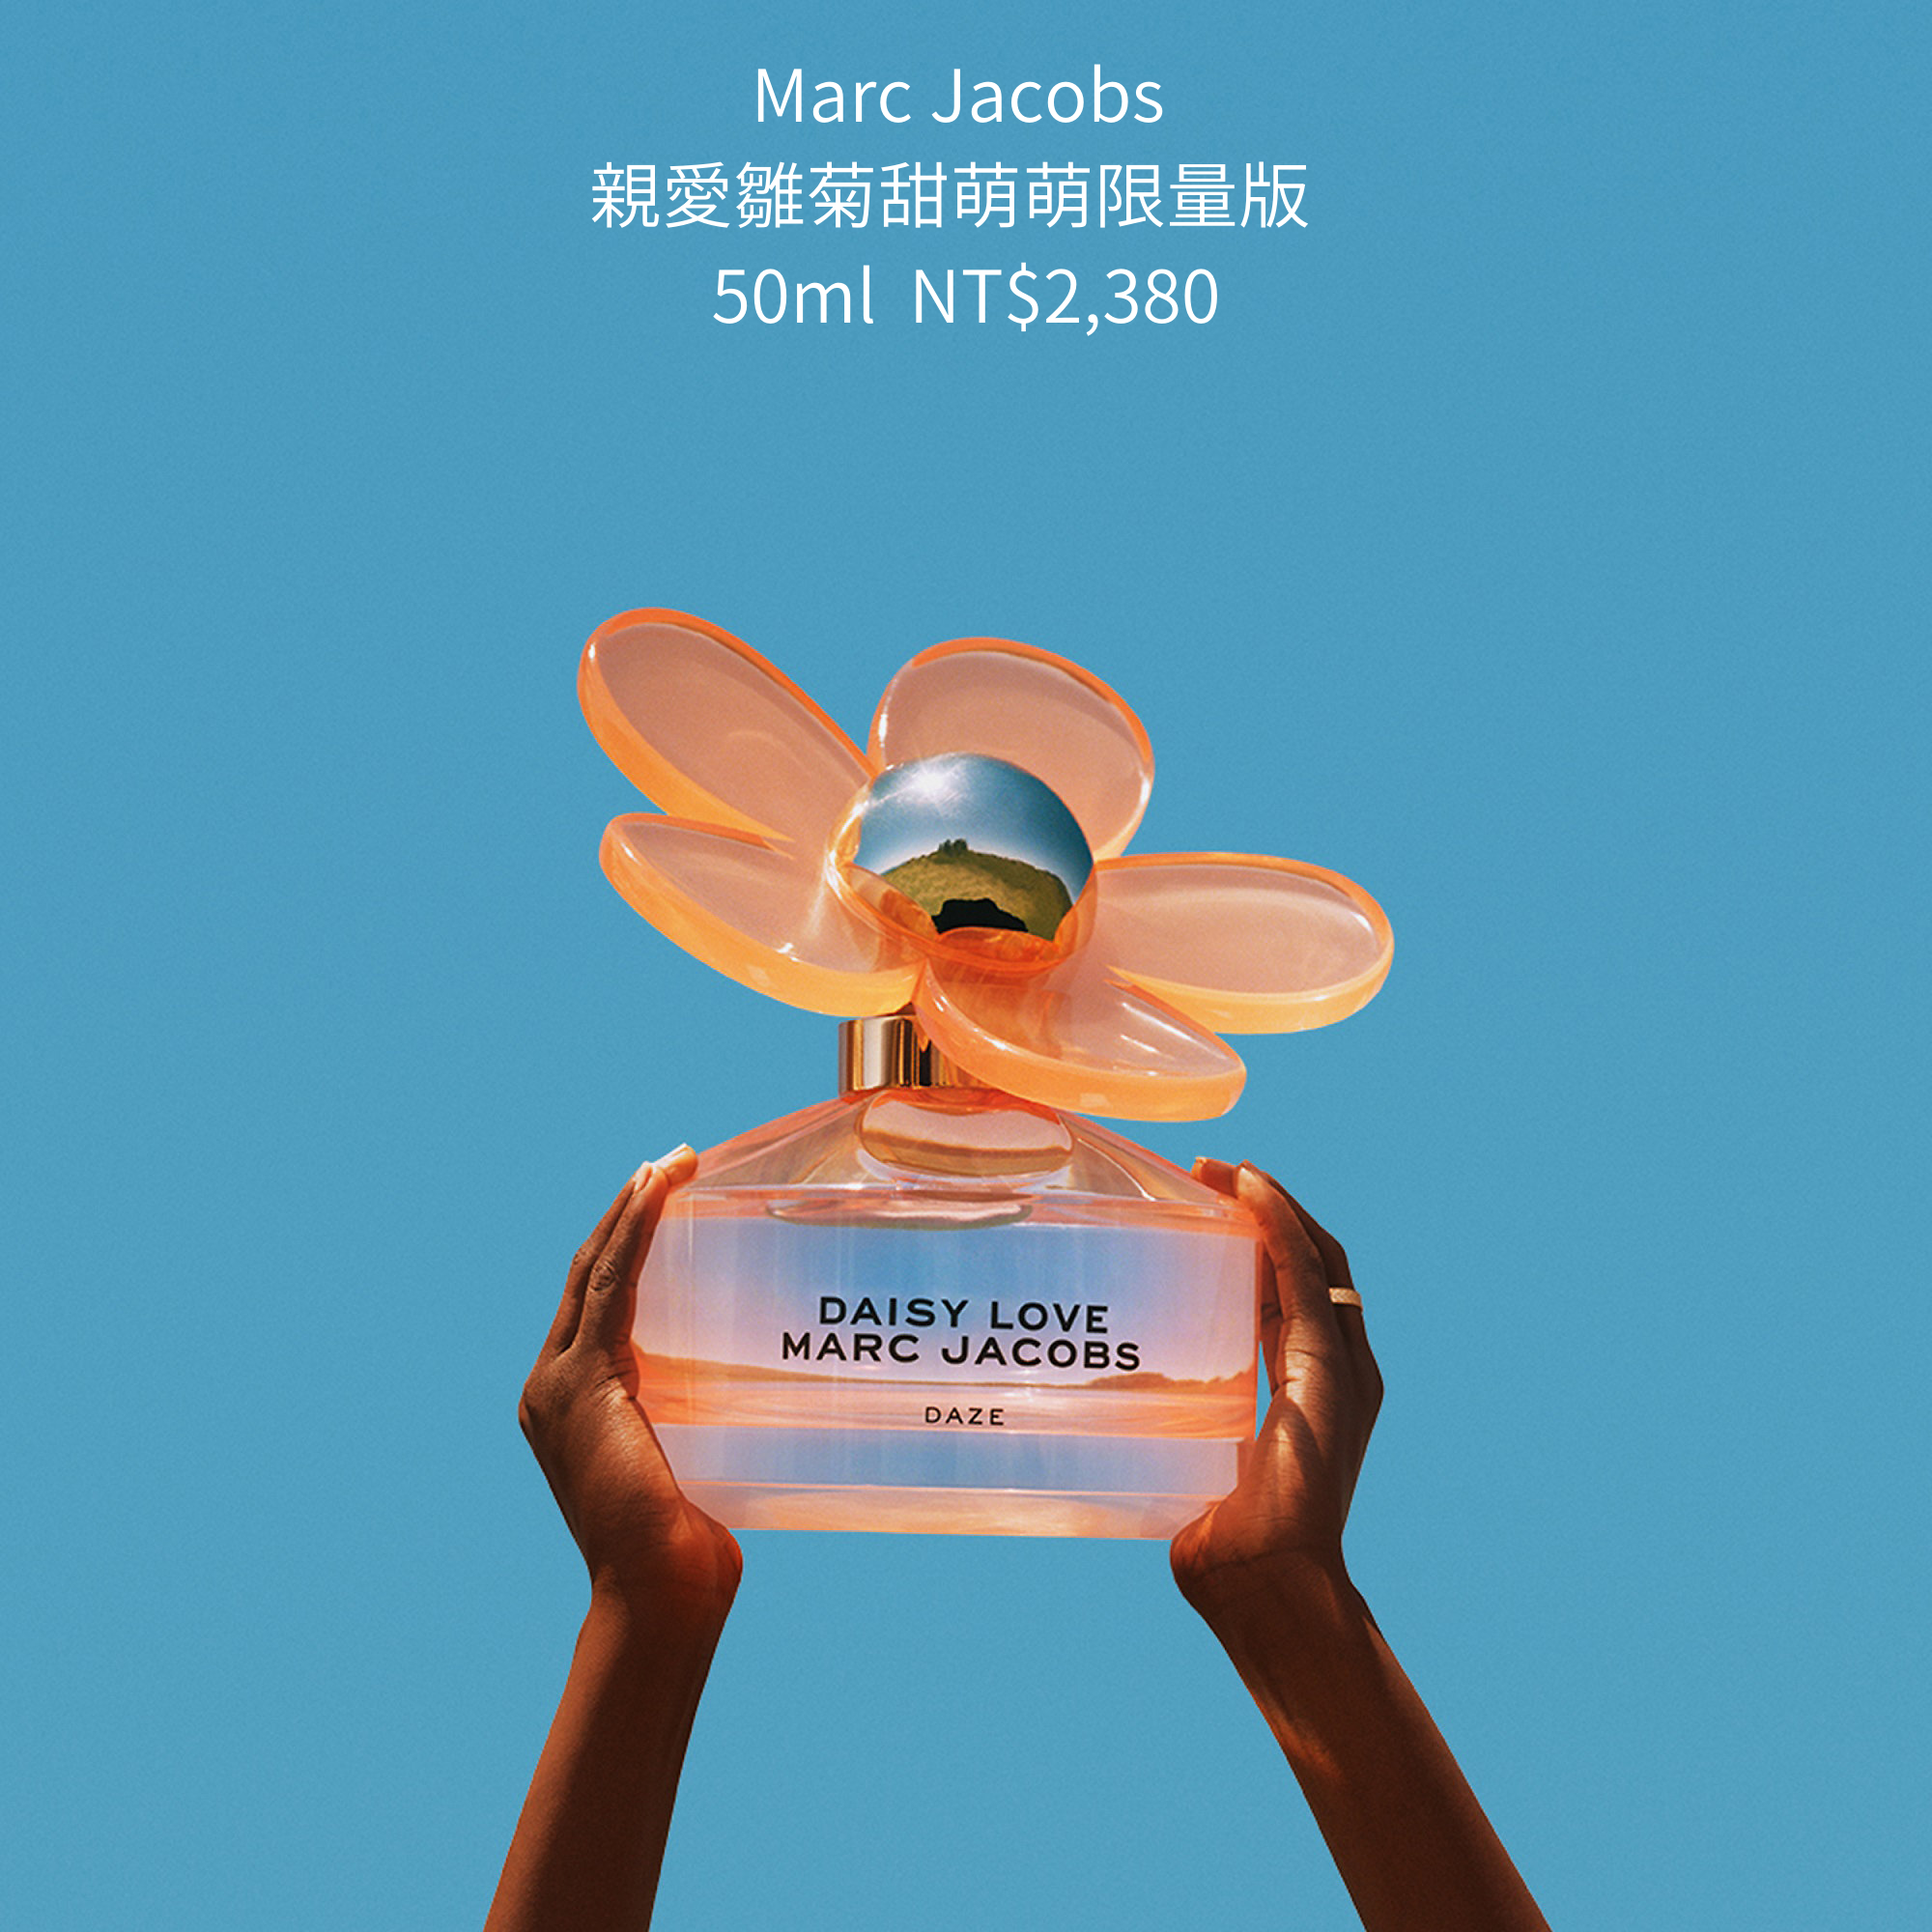 Marc Jacobs 親愛雛菊甜萌萌限量版 50ml NT$2,380